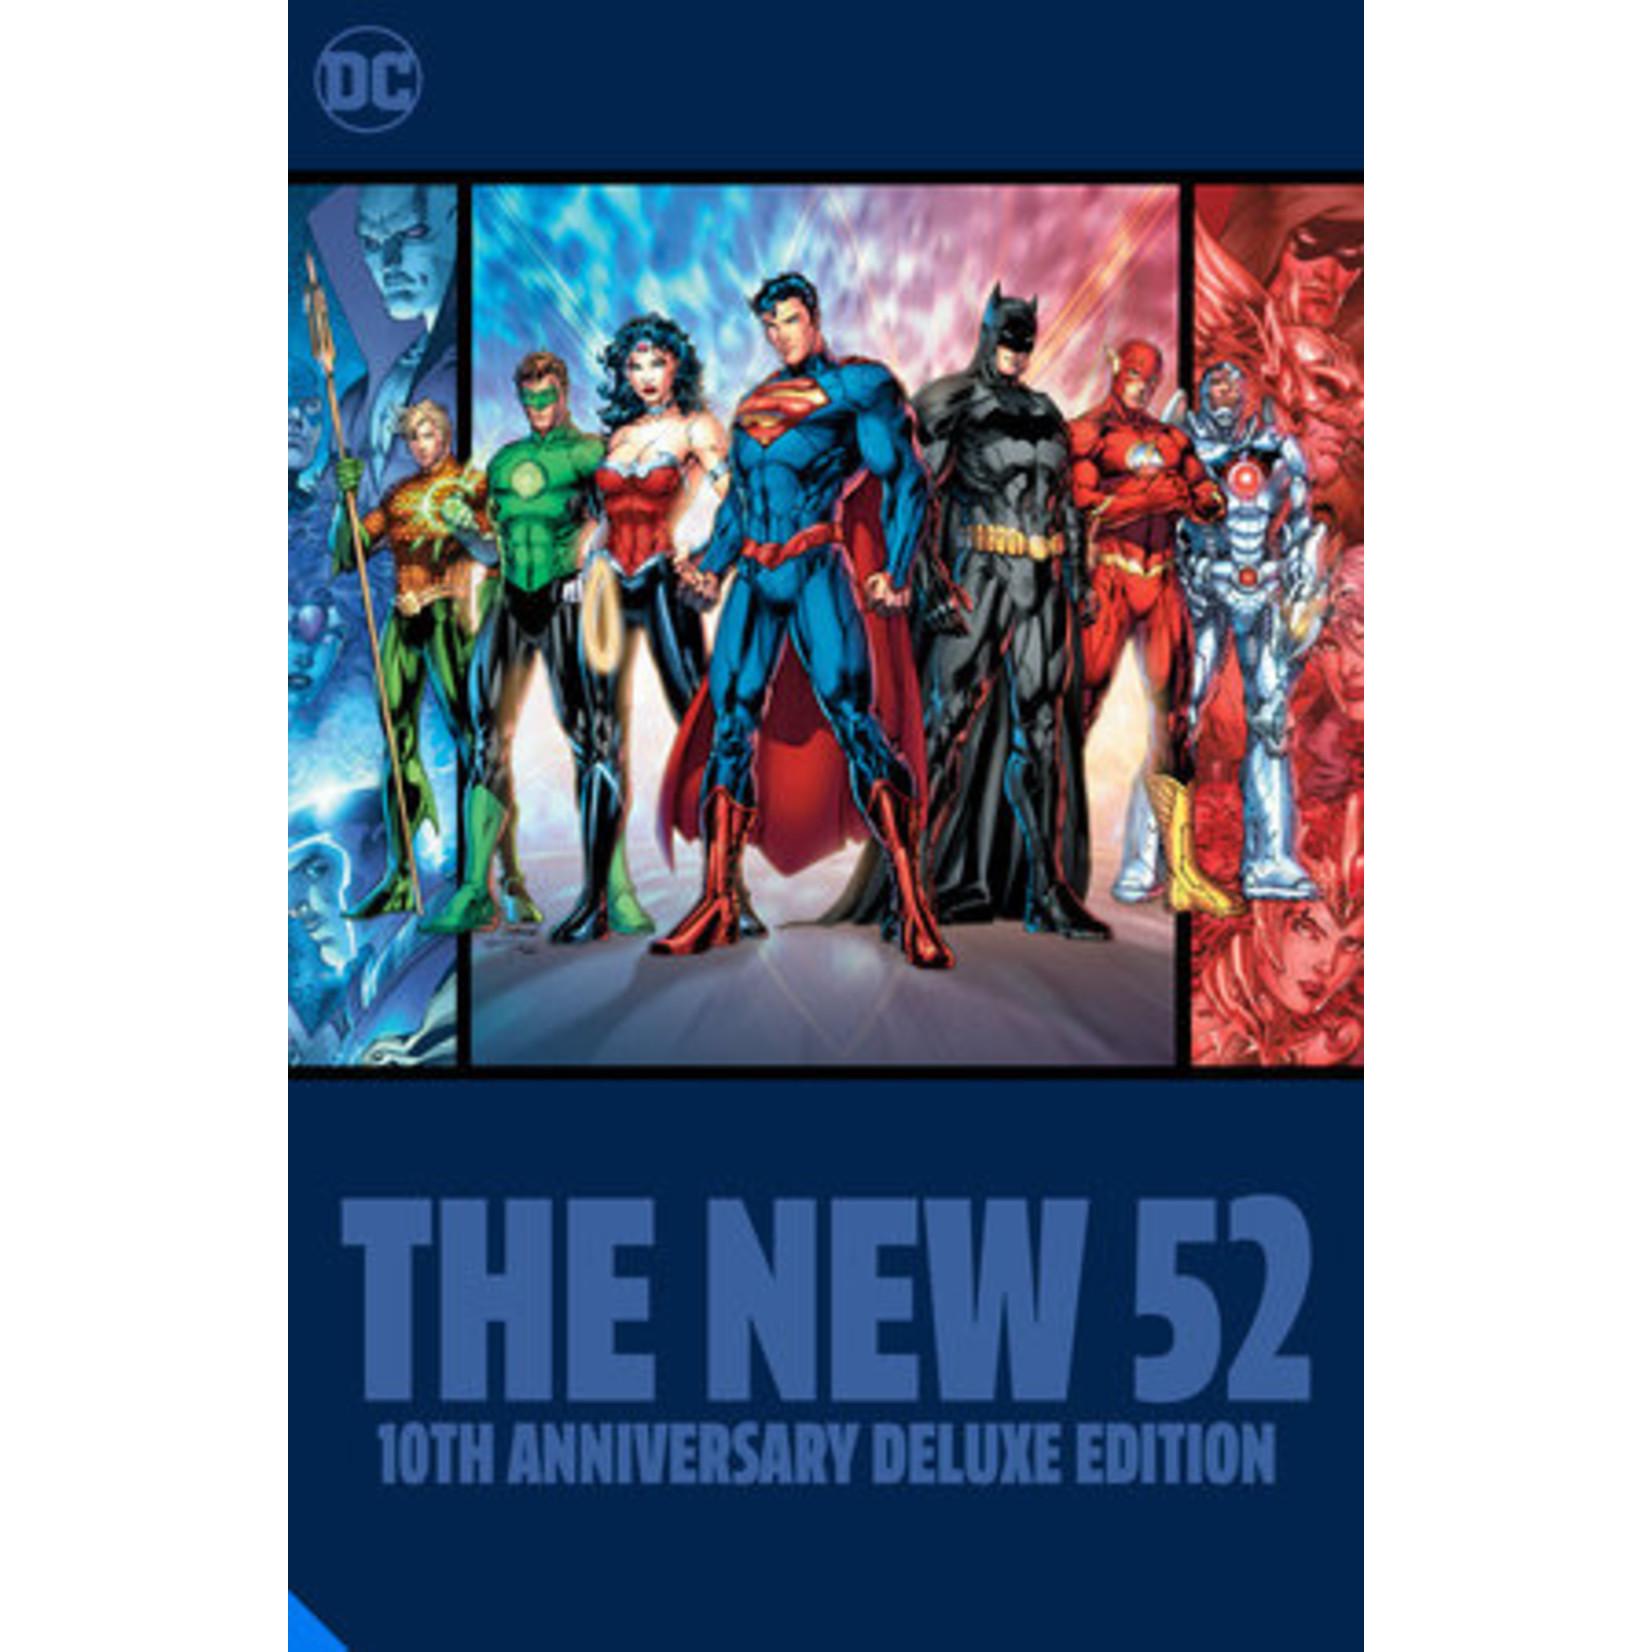 DC Comics DC Comics: The New 52 10th Anniversary Deluxe Edition